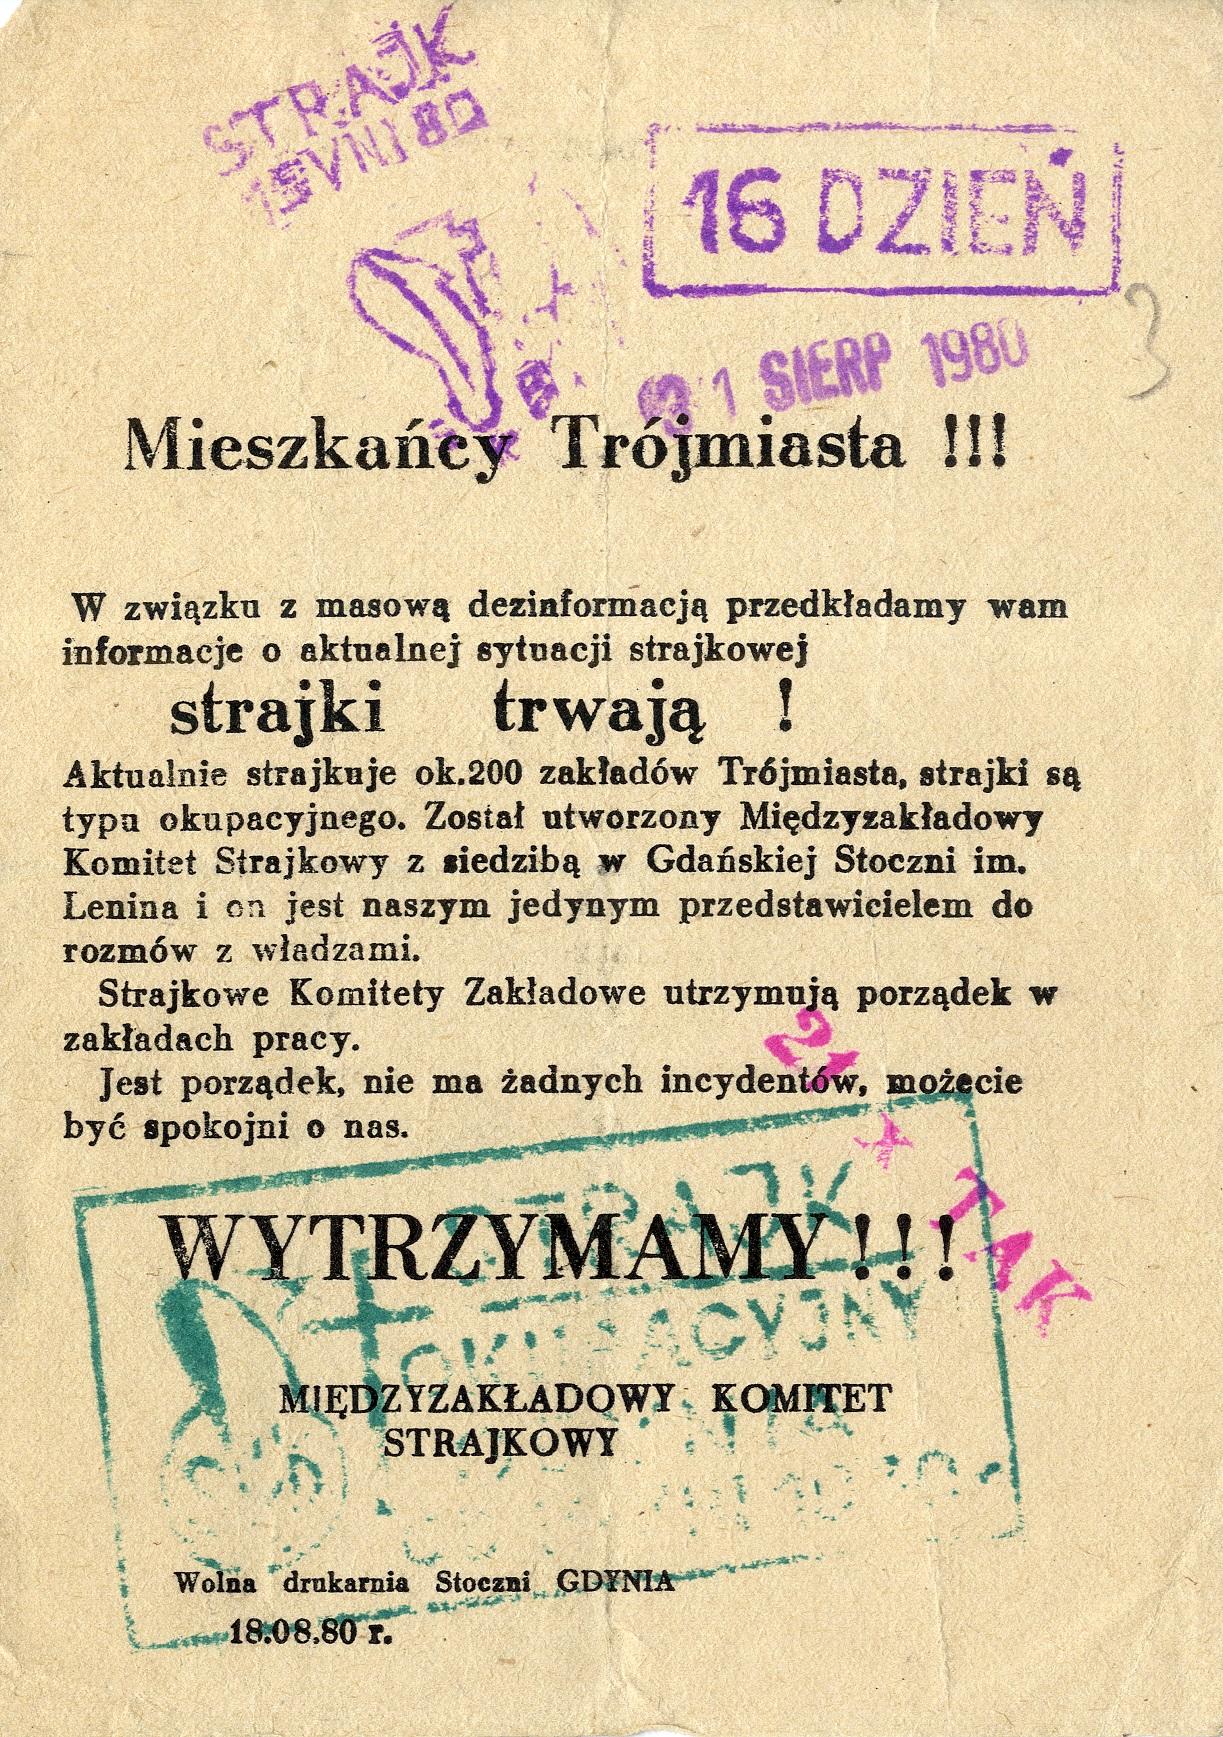 Z Archiwum Solidarności - Solidarity Archives